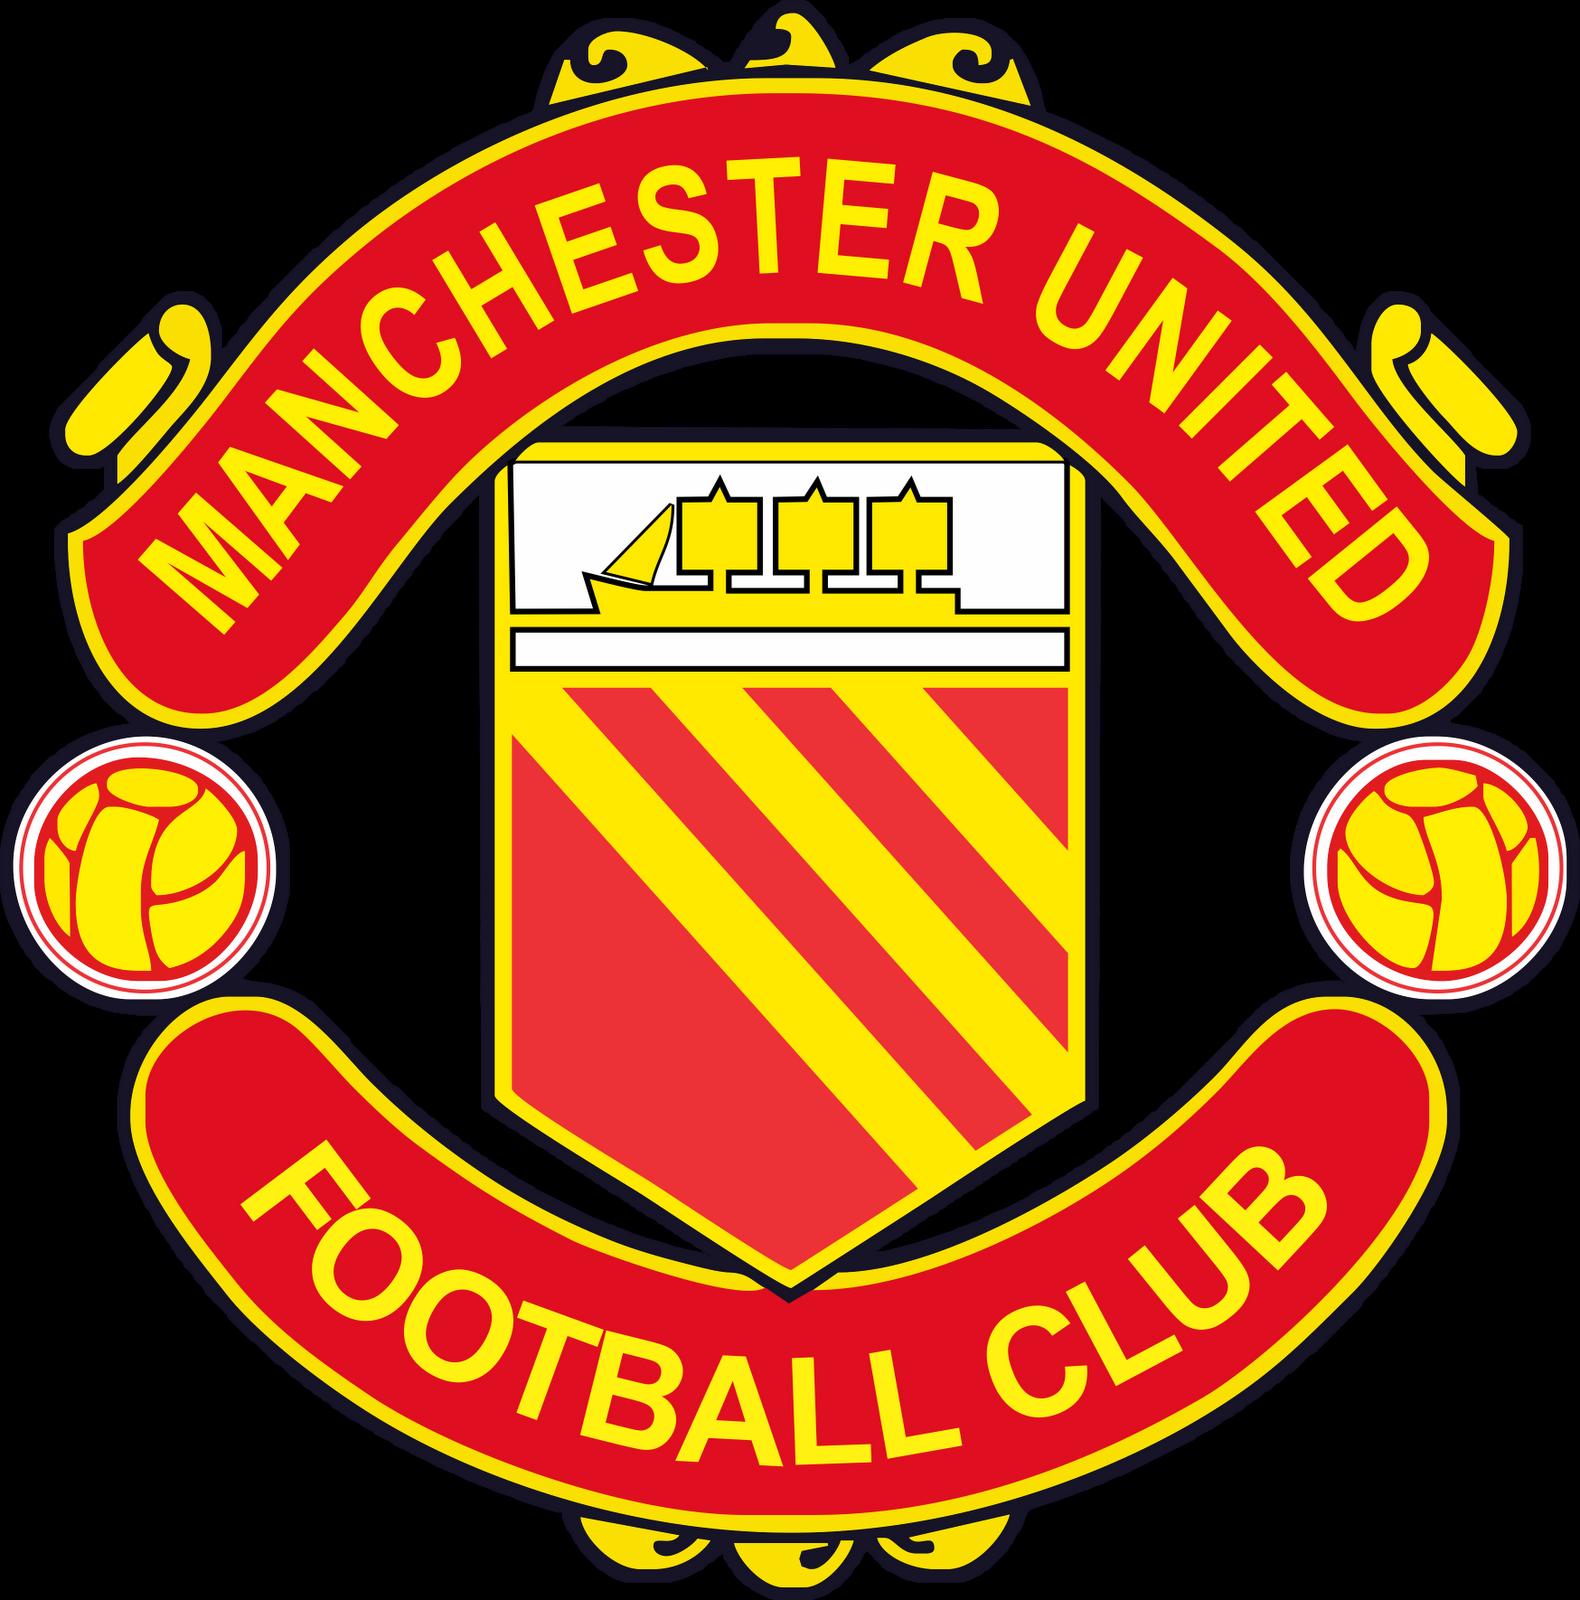 「mufc logo 1960」の画像検索結果